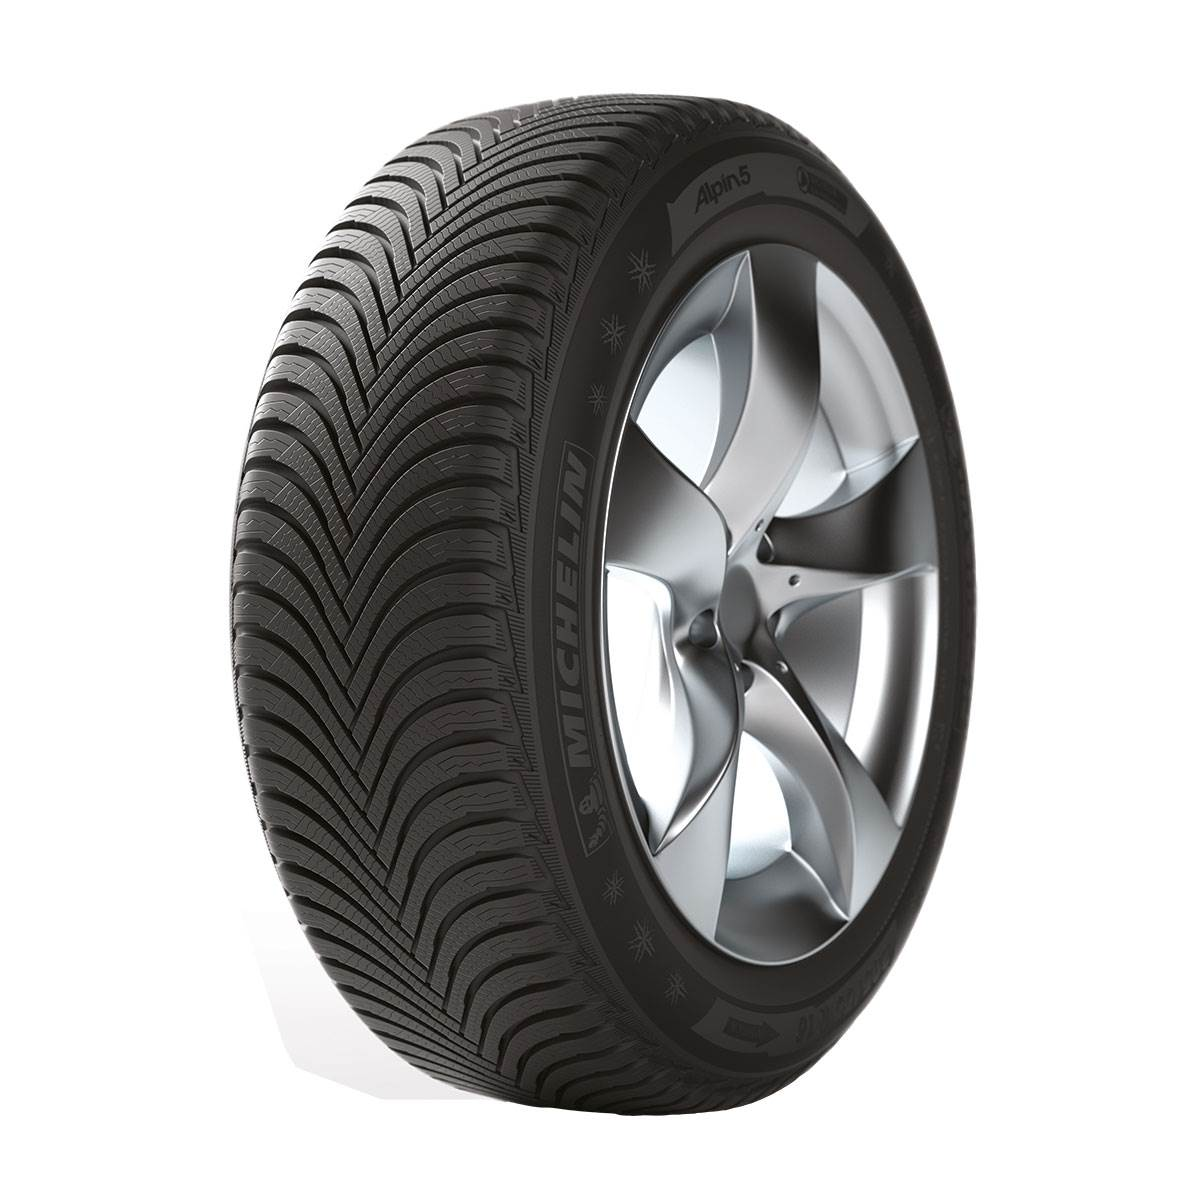 Pneu Hiver Michelin 215/45R16 90V Alpin A5 XL